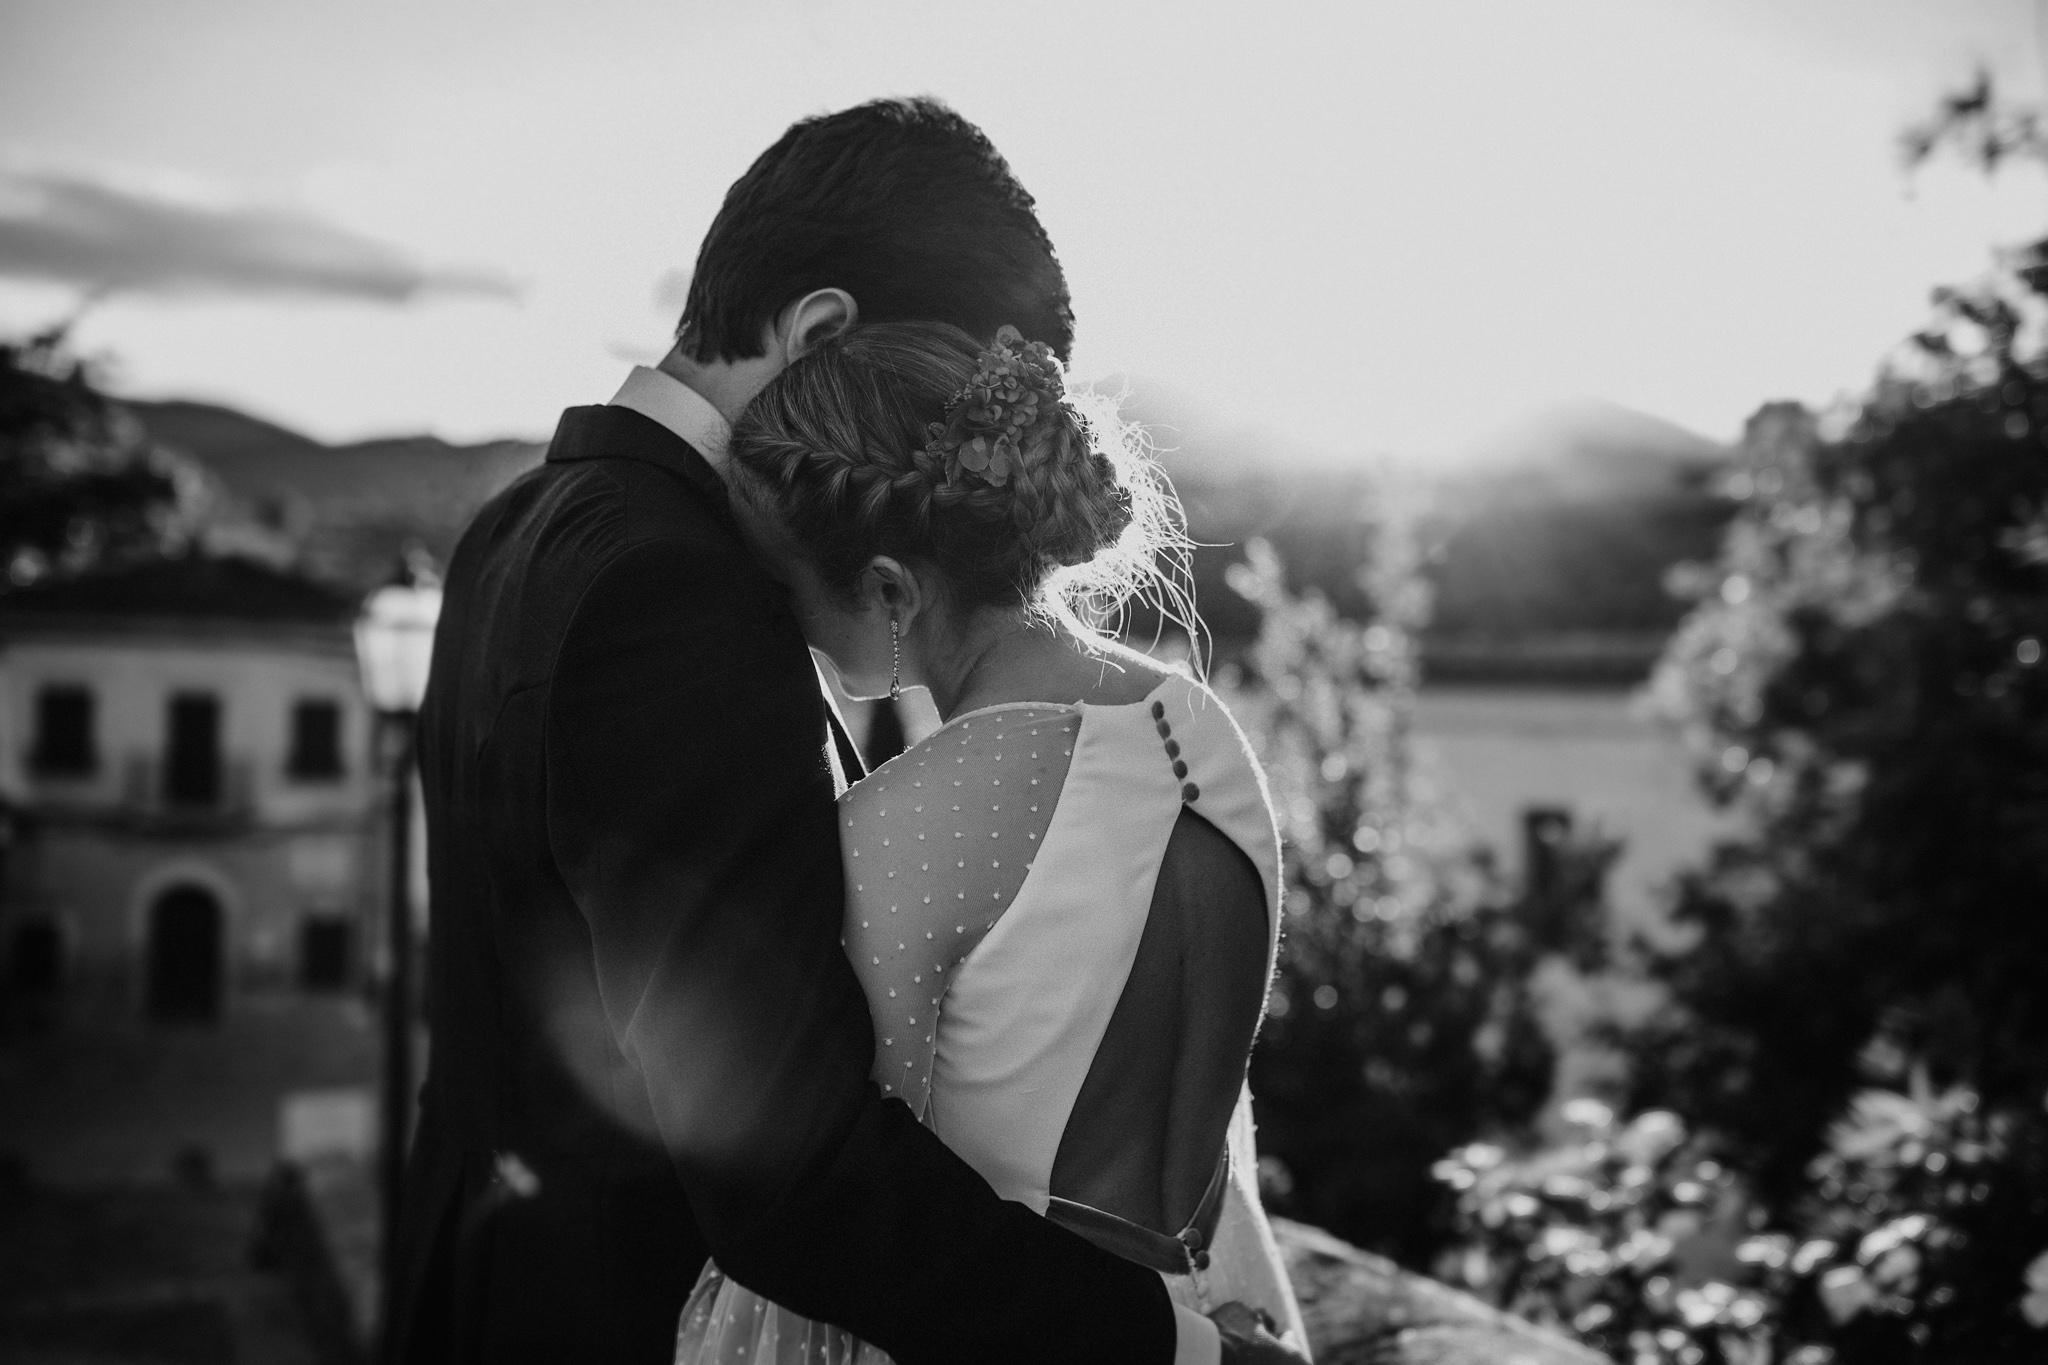 fotografia-boda-wedding-photographer-spain-concorazon-236